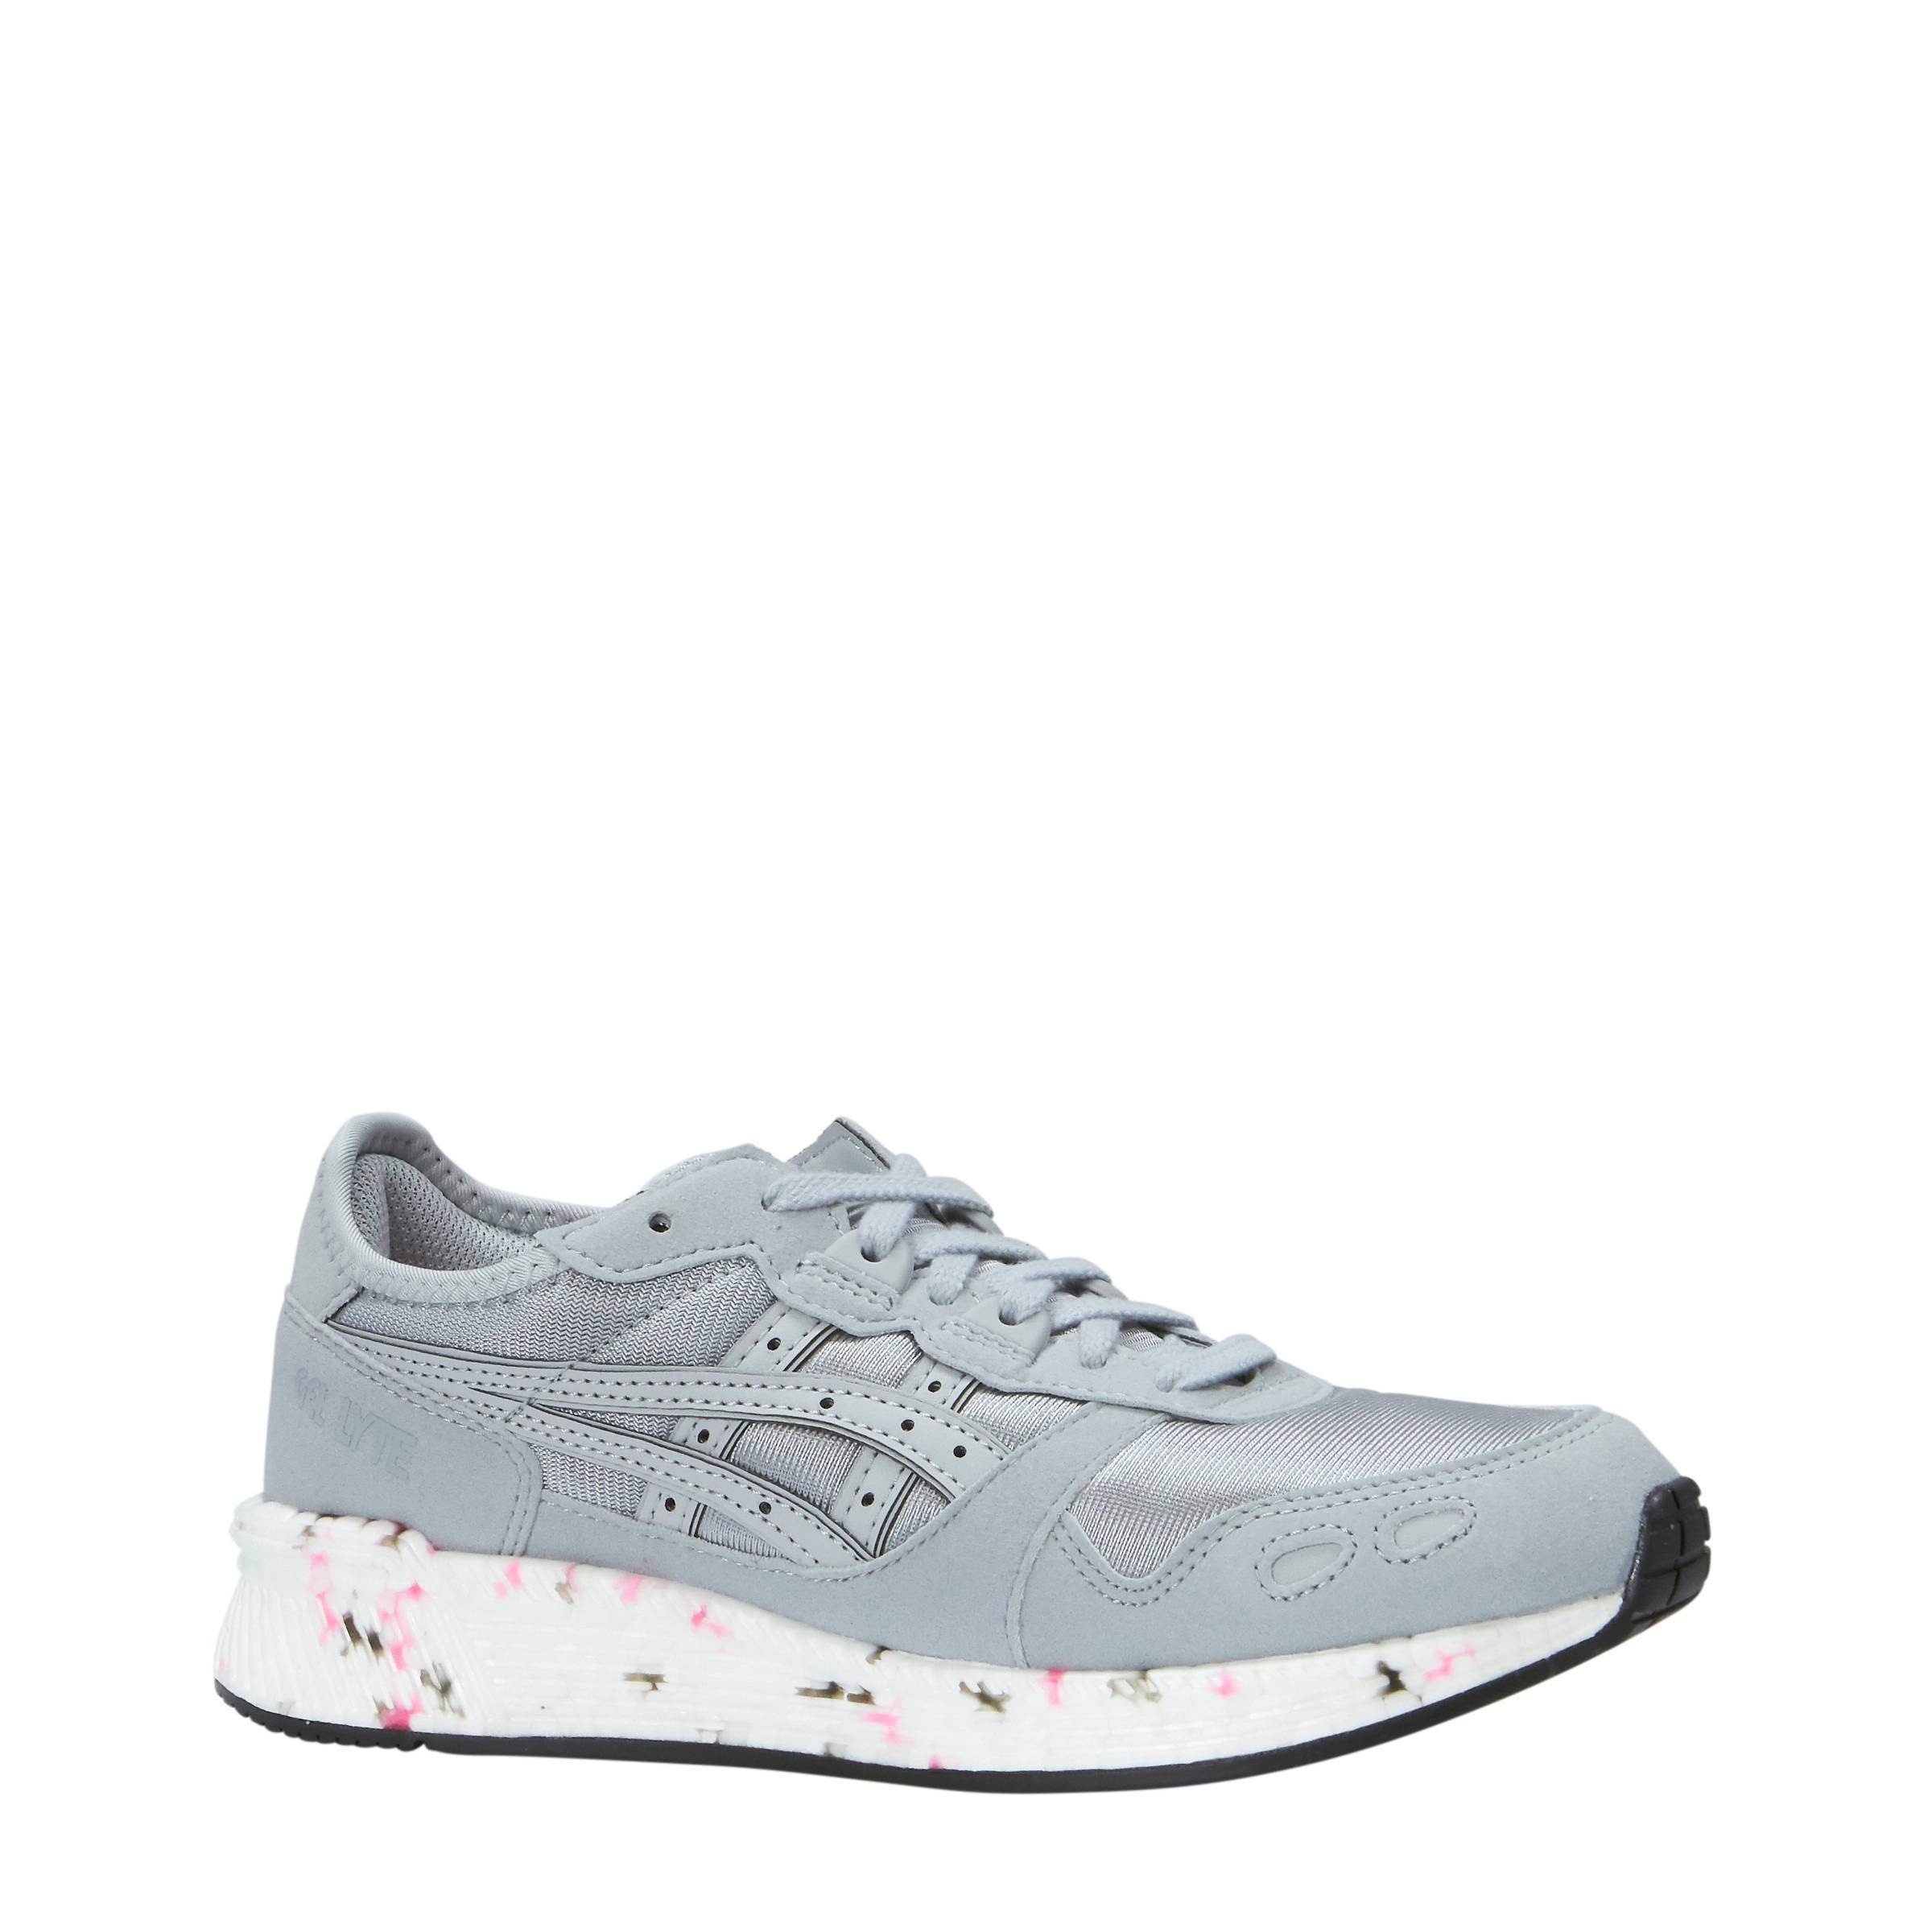 asics kinder sneakers